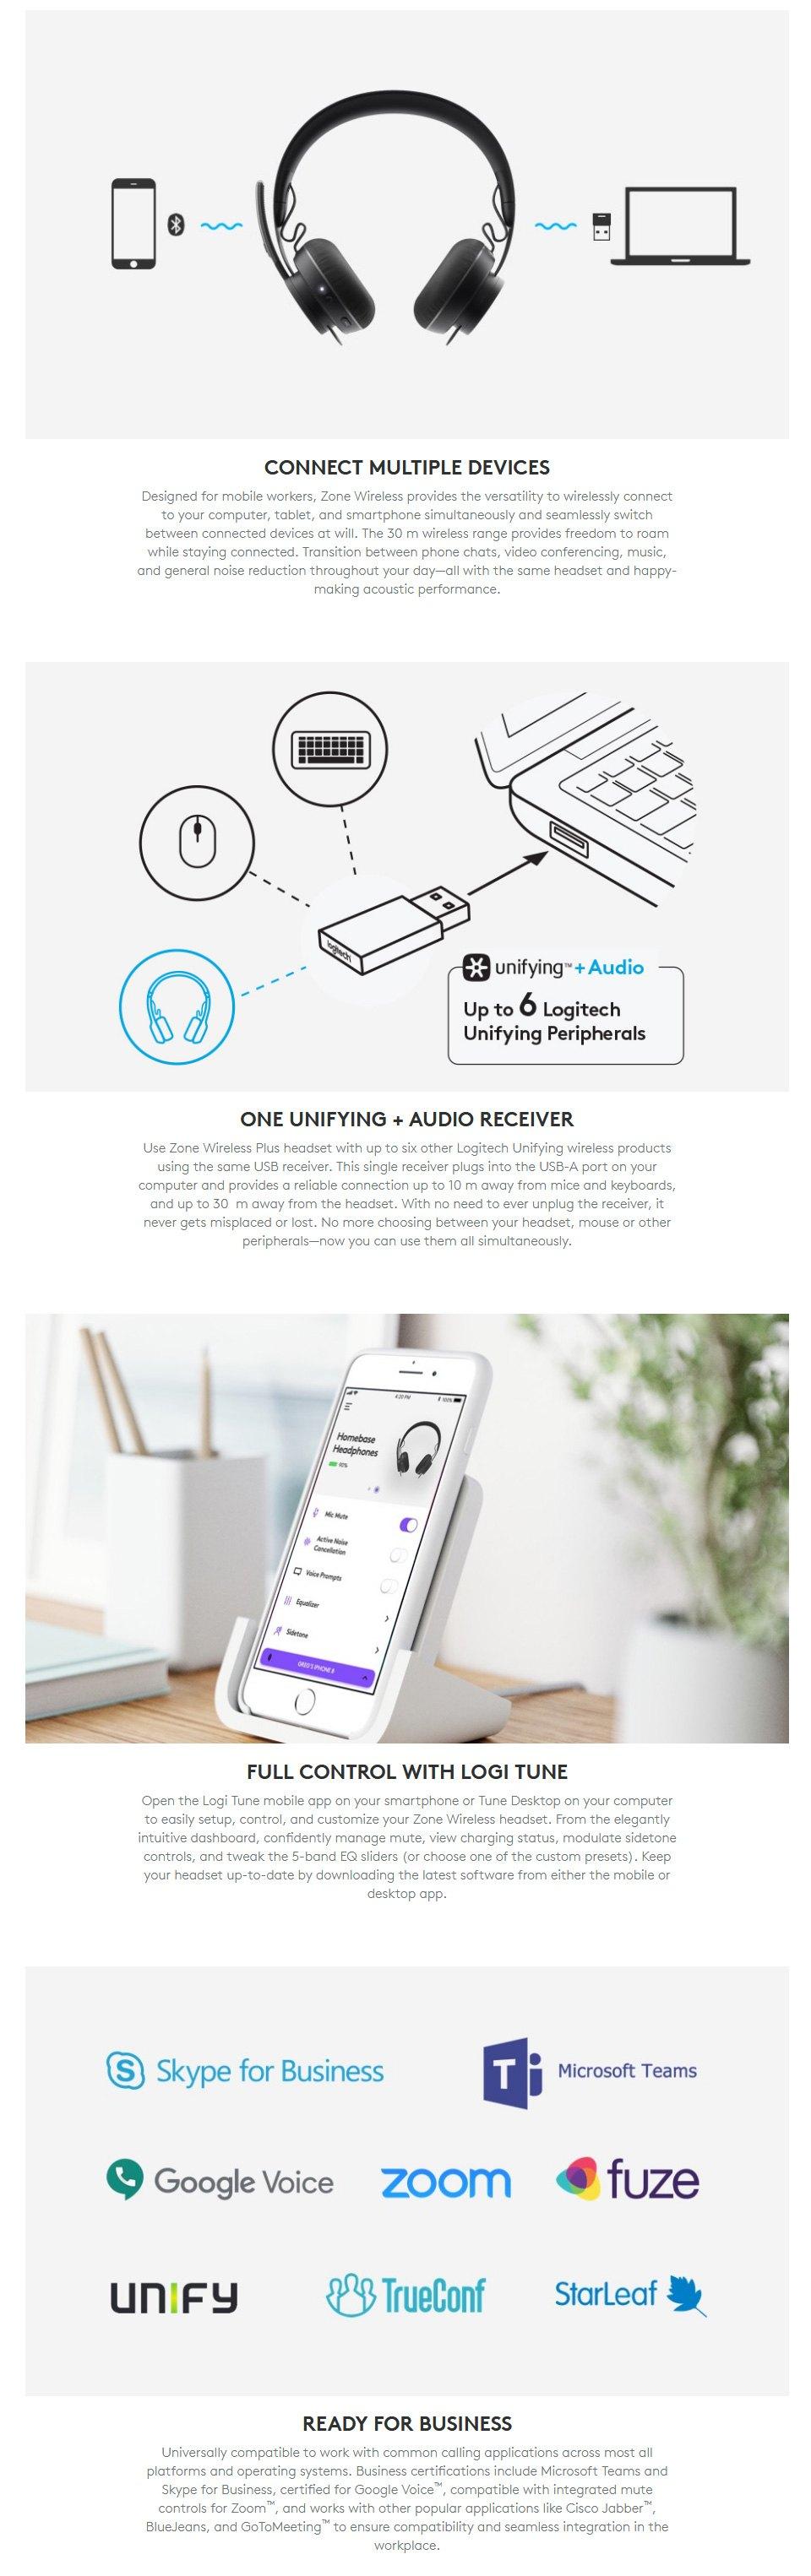 Logitech Zone Wireless Bluetooth Headset features 3